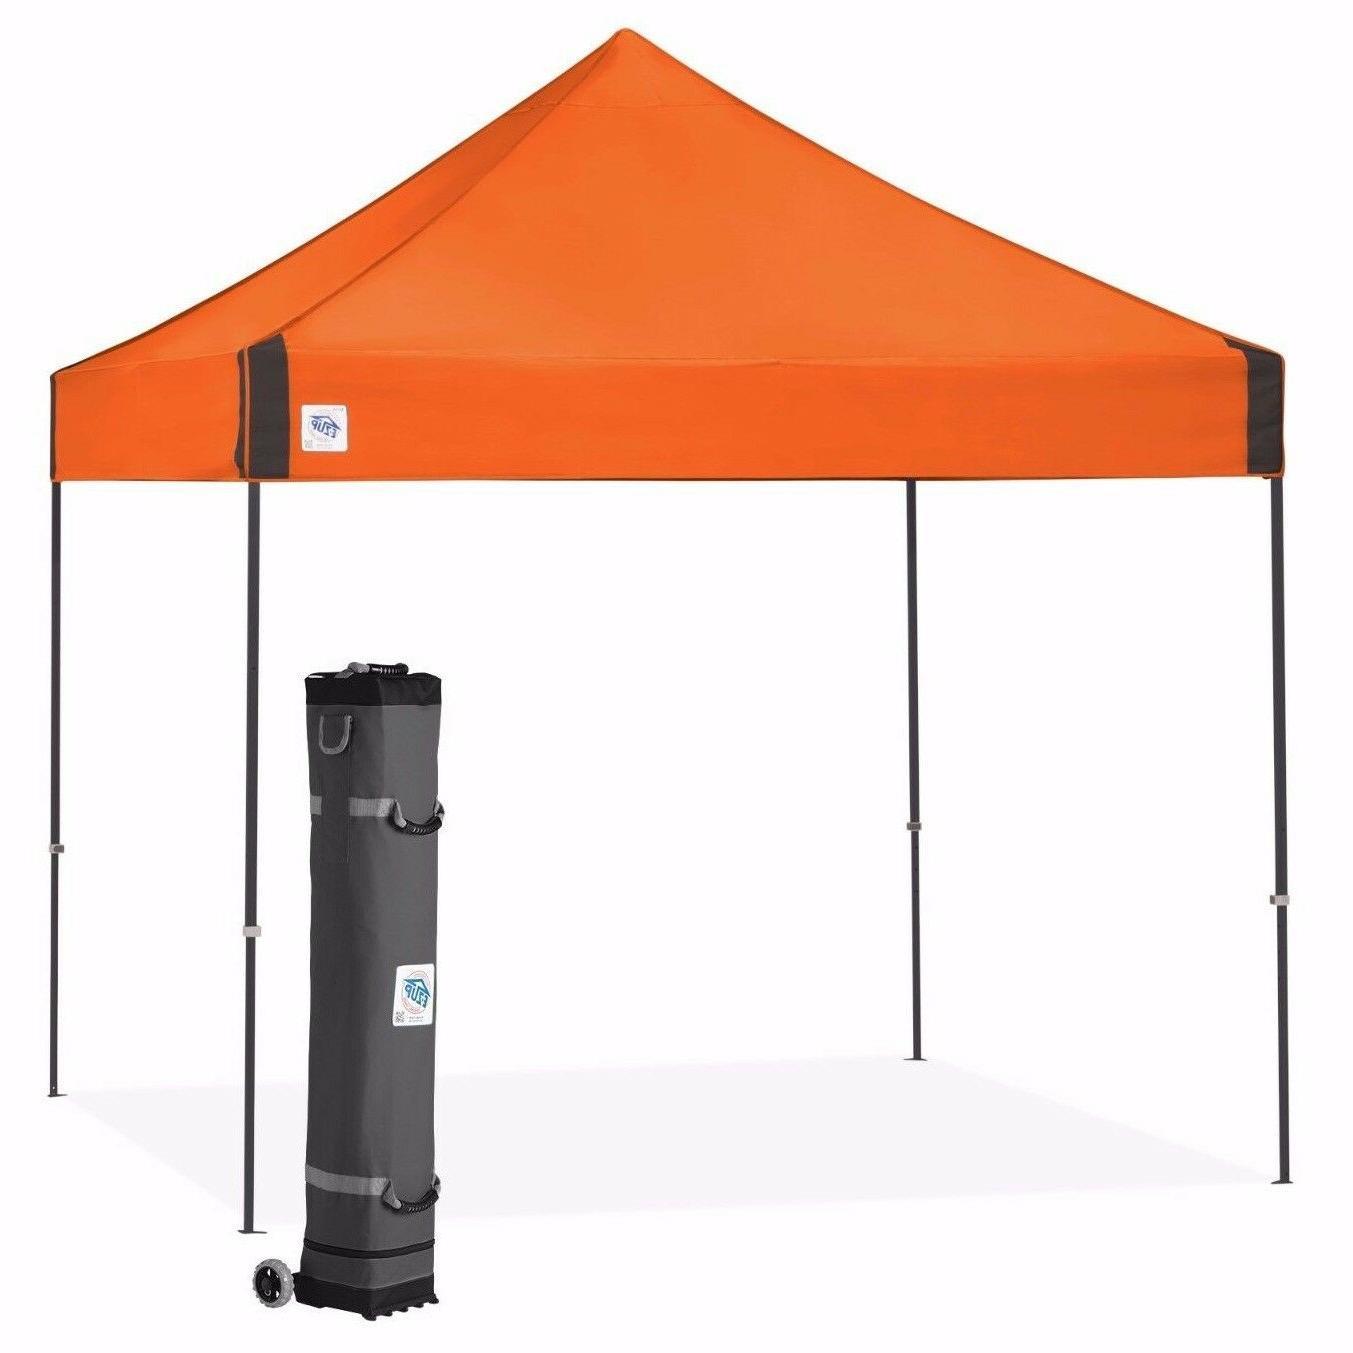 Vantagetm 10 Ft. W x 10 Ft. D Canopy, Steel Orange